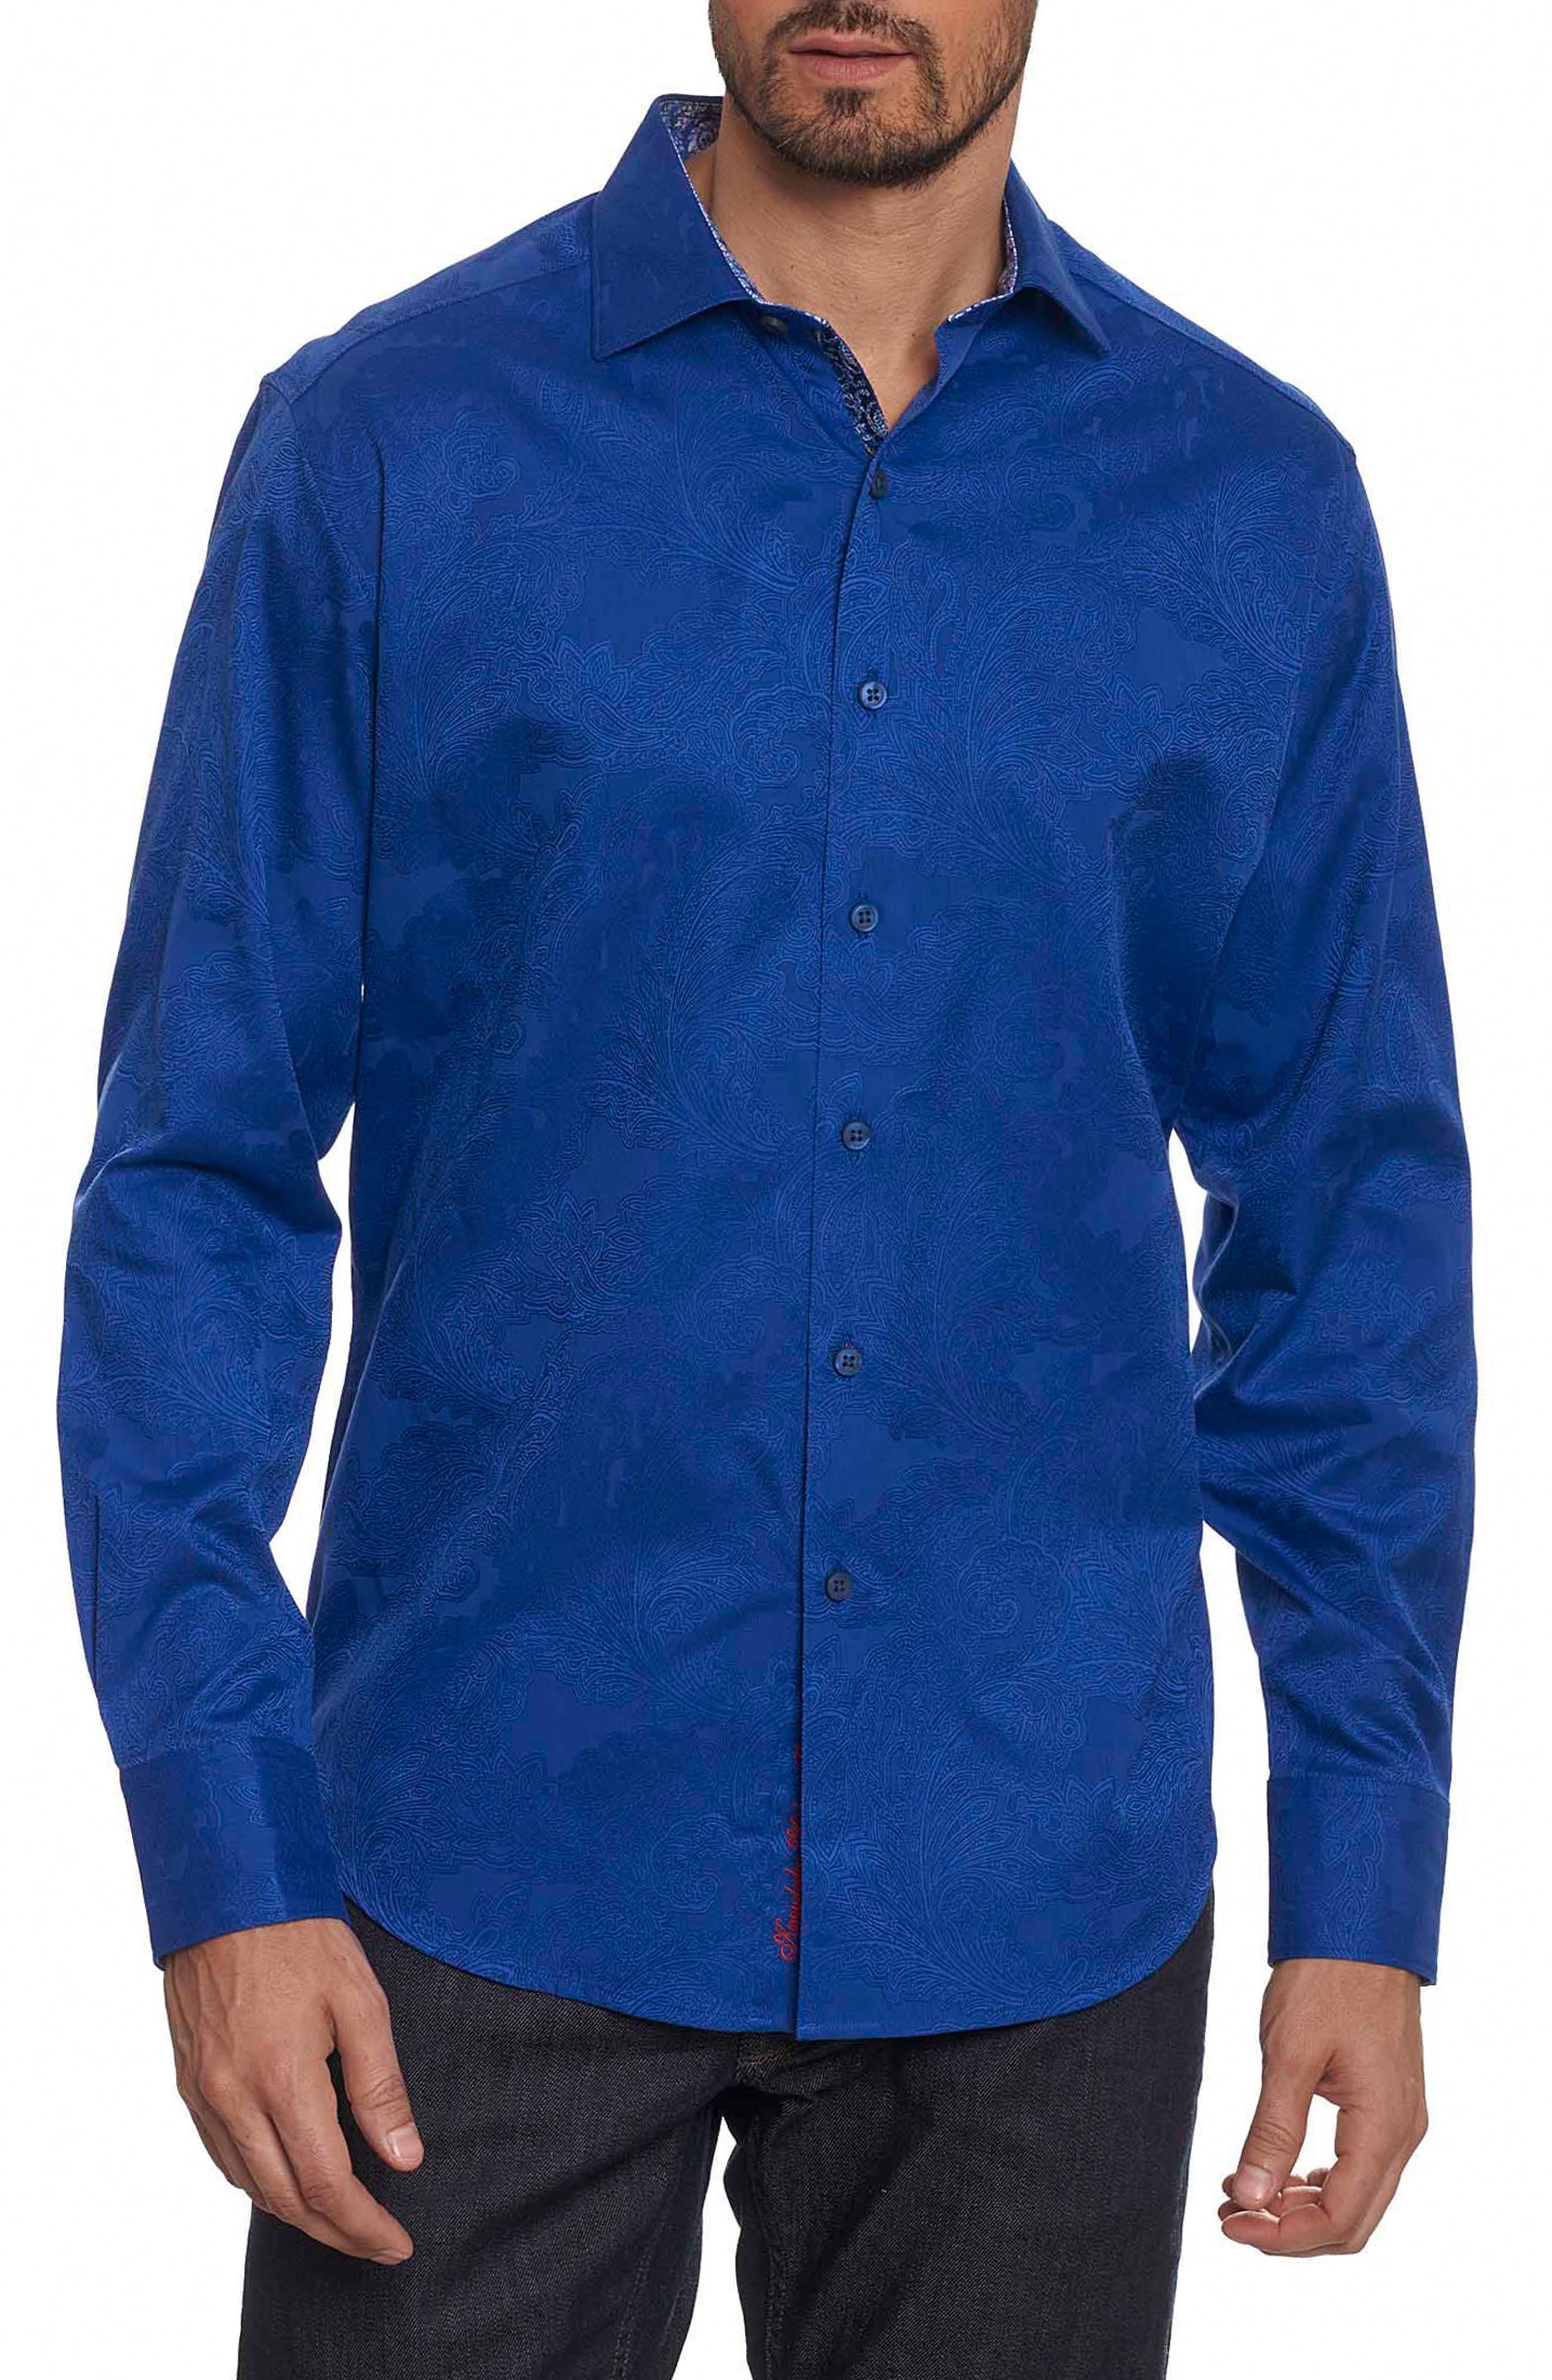 Rosendale Classic Fit Jacquard Sport Shirt,                             Main thumbnail 1, color,                             Cobalt